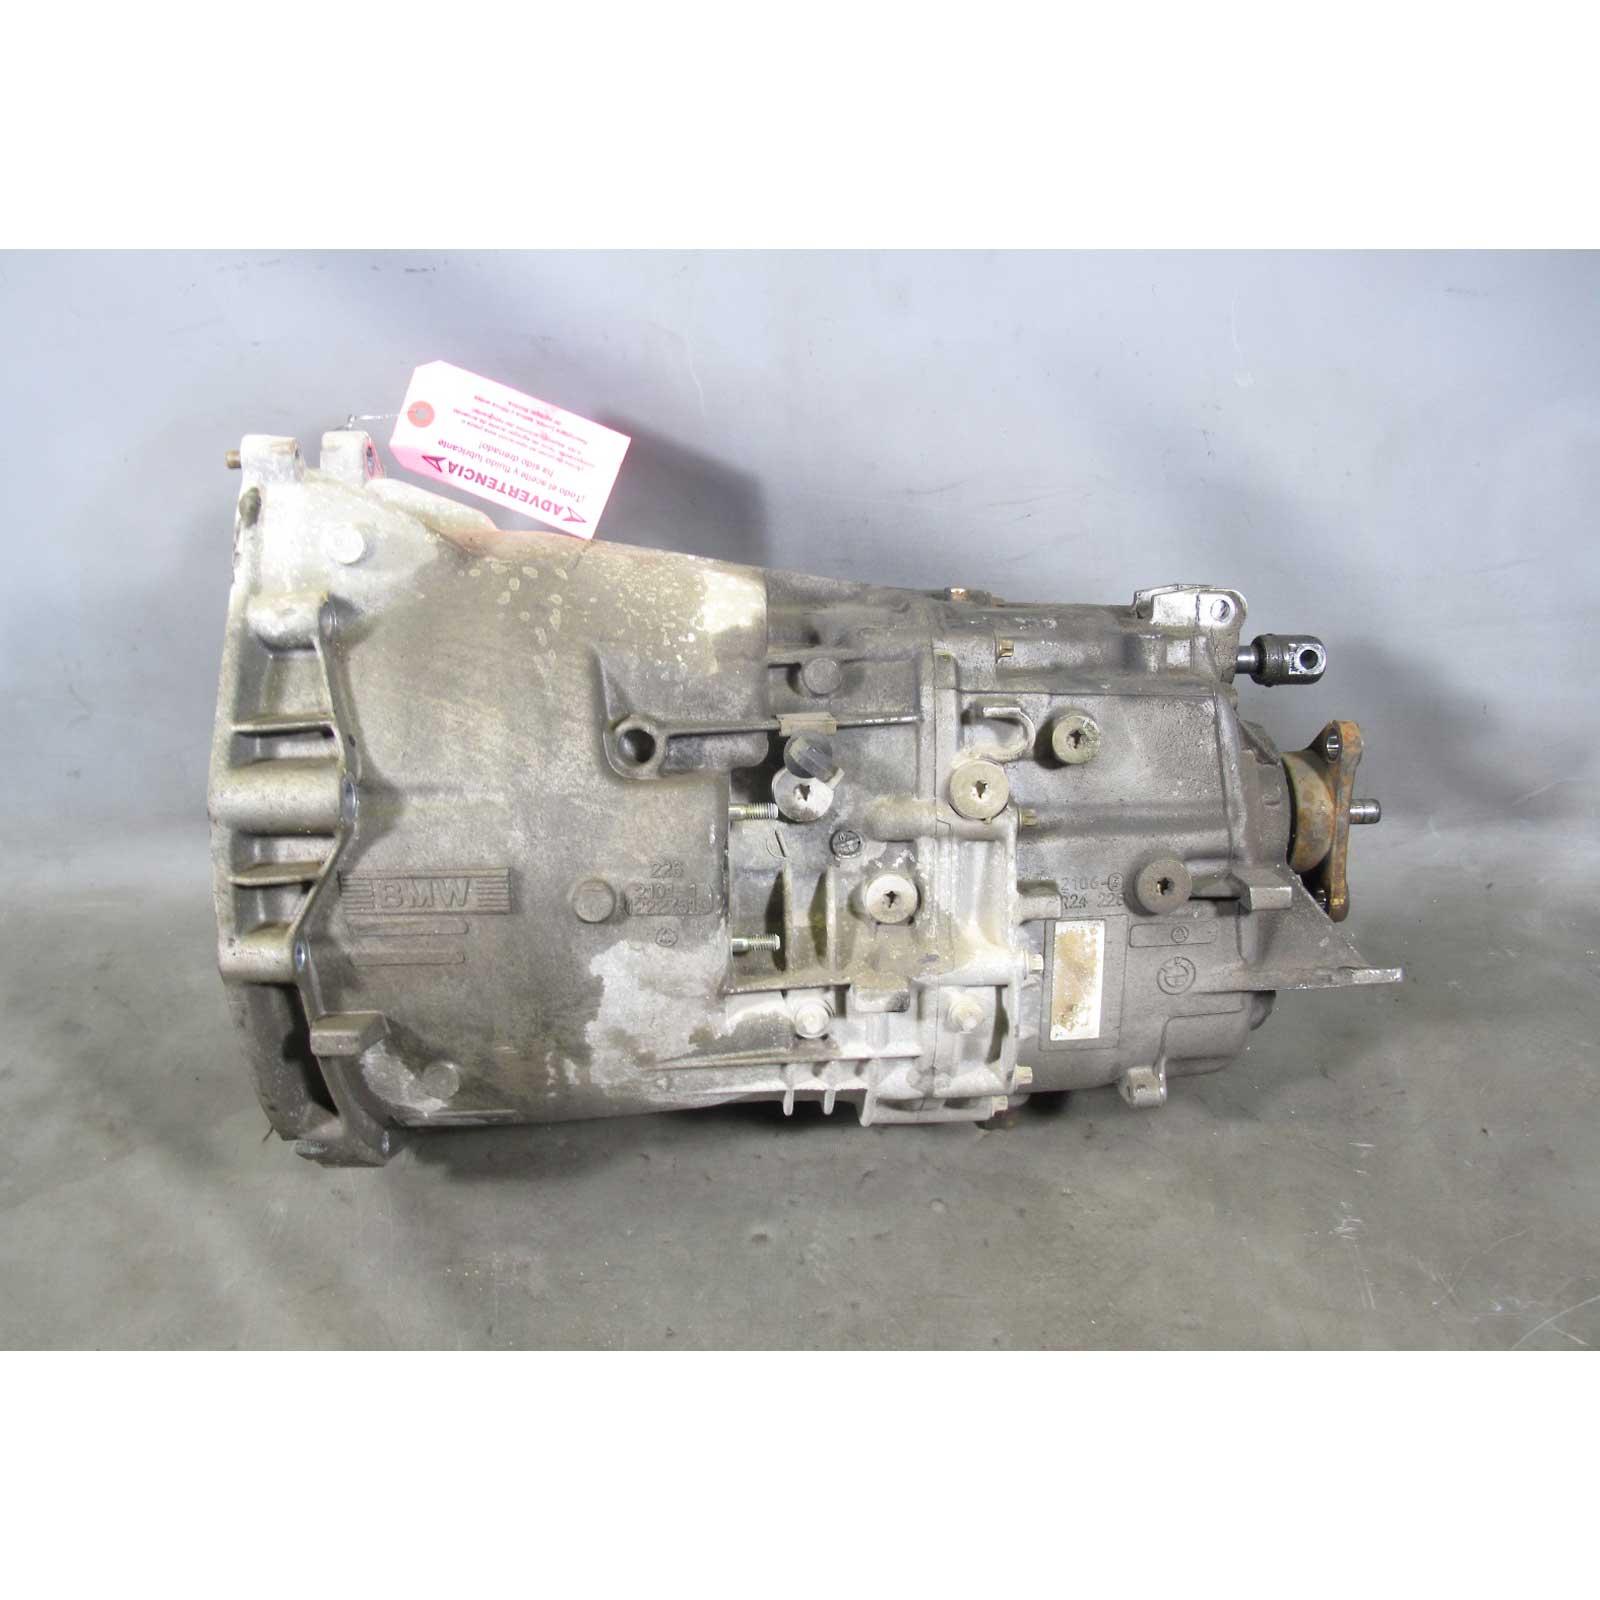 Bmw E46 3 Series E36 E39 Zf 320z 5 Speed Manual